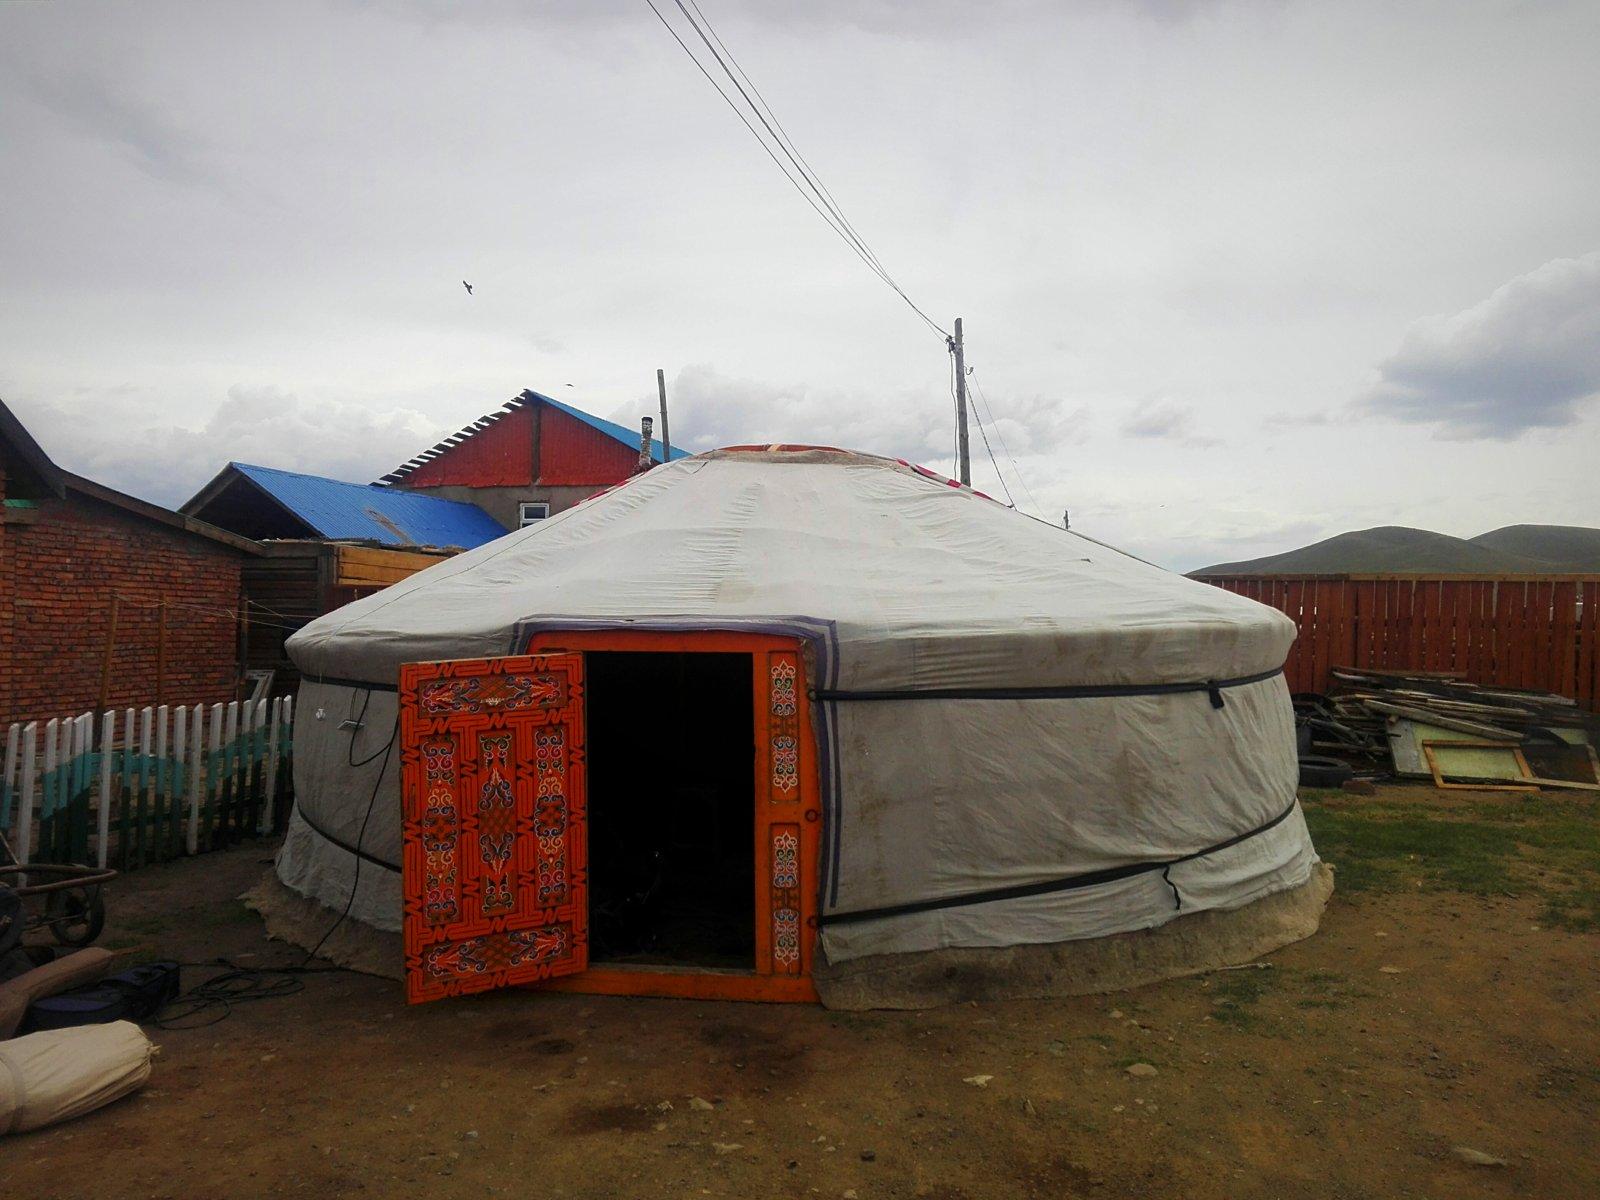 img_20160524_013203-jpg.30635_Mongolia Rainbow Horse Caravan_Travel Stories_Squat the Planet_4:14 AM